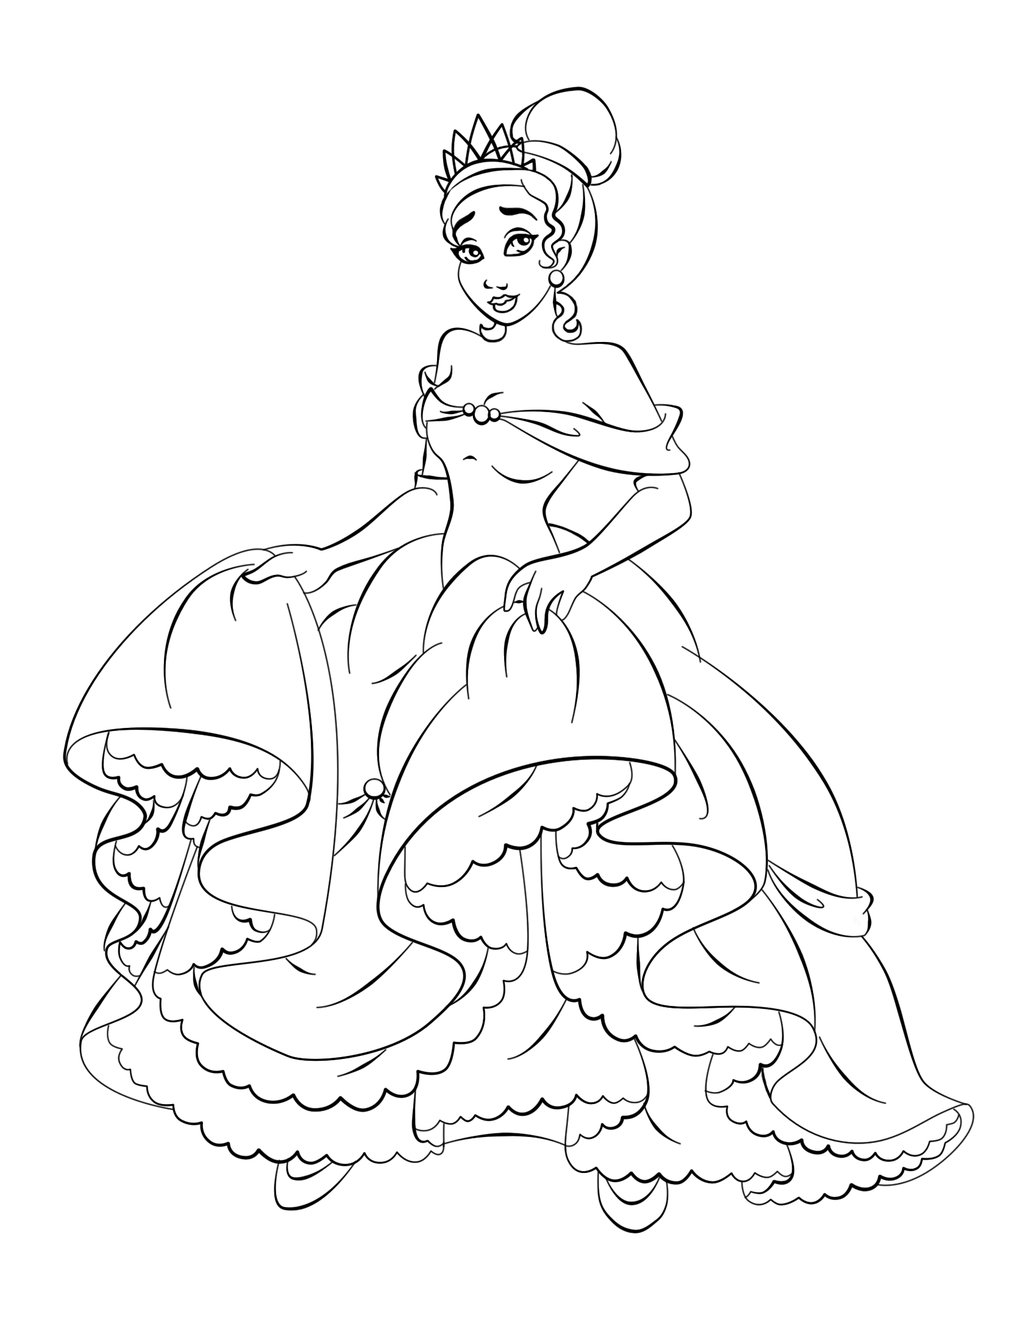 Rapunzel coloring games online free - Princess Coloring Game